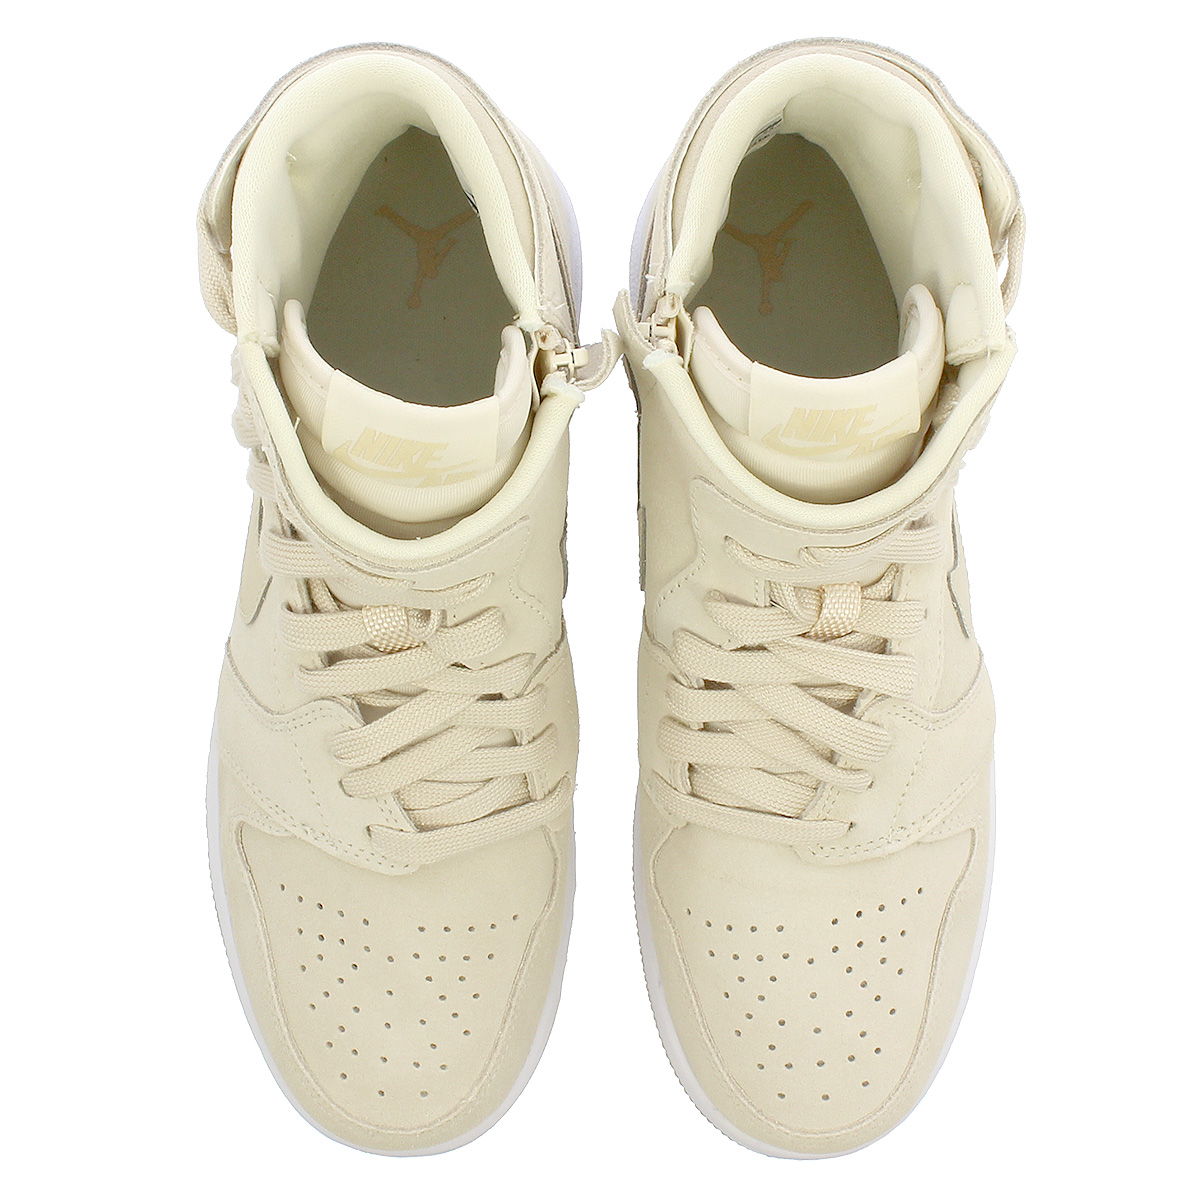 868ccb2a248 ... NIKE WMNS AIR JORDAN 1 REBEL XX Nike women Air Jordan 1 level XX LIGHT  CREAM ...